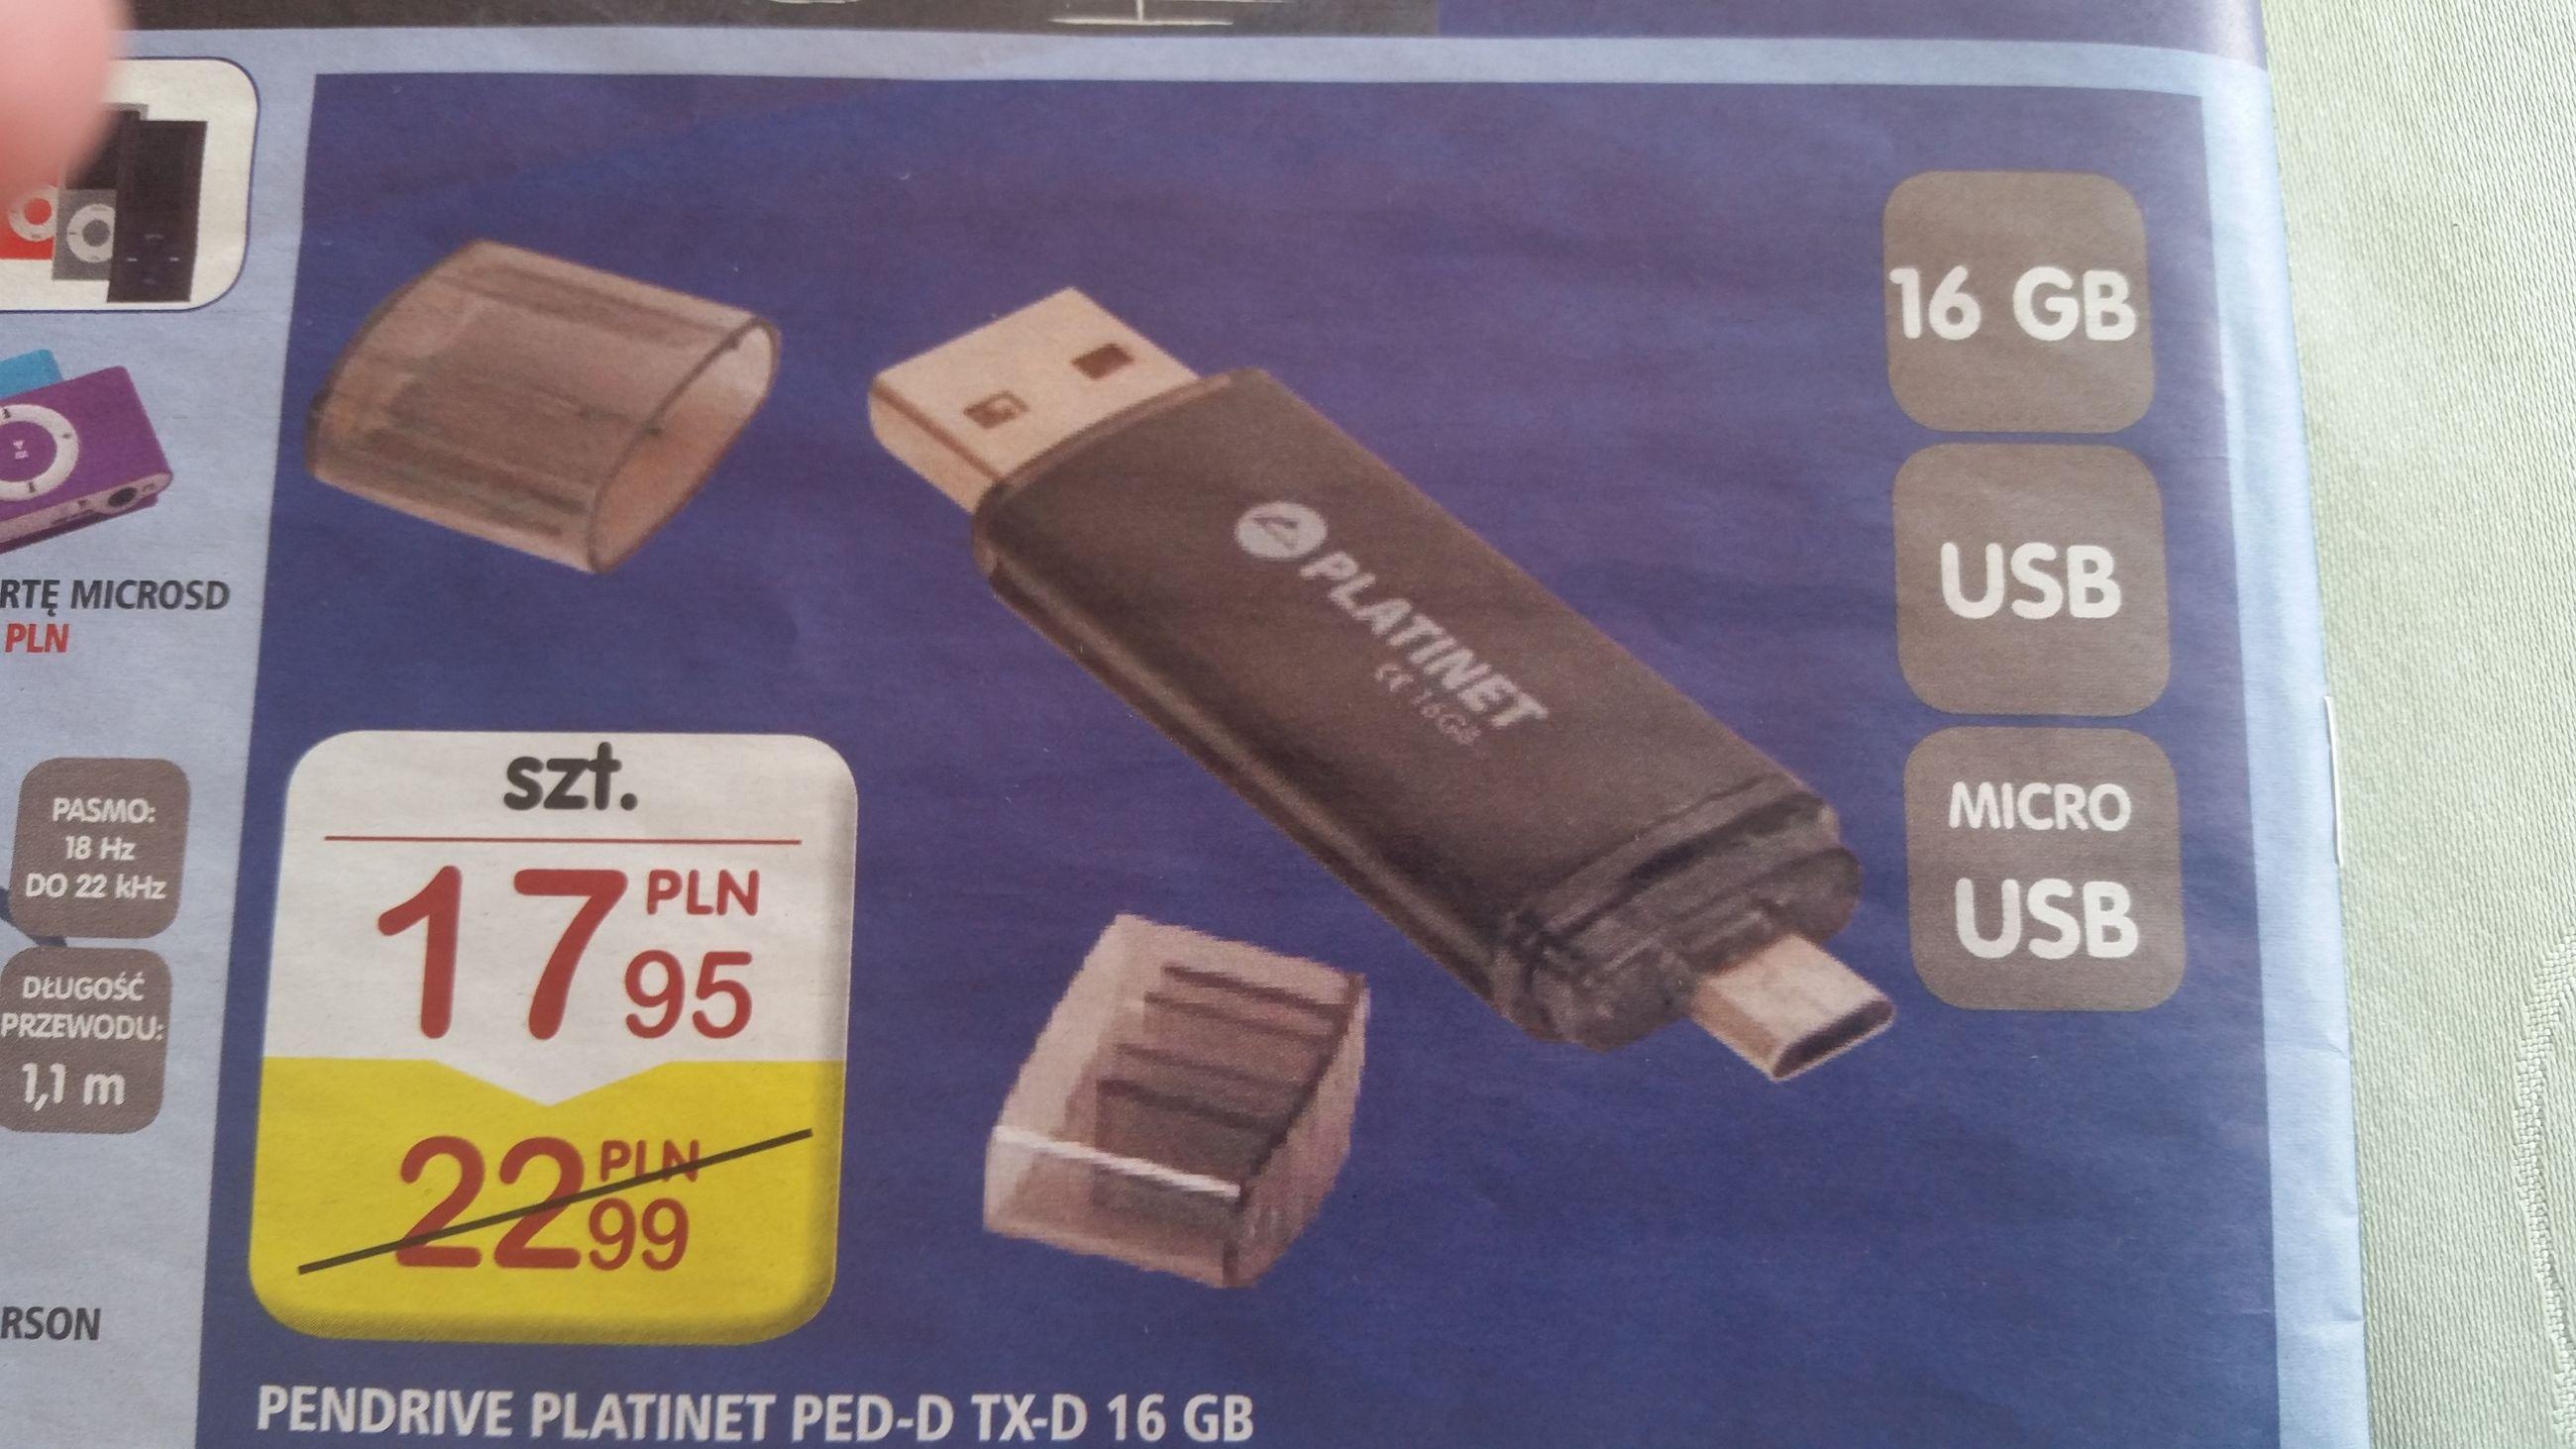 Pendrive Platinet PED-D TX-D 16 GB